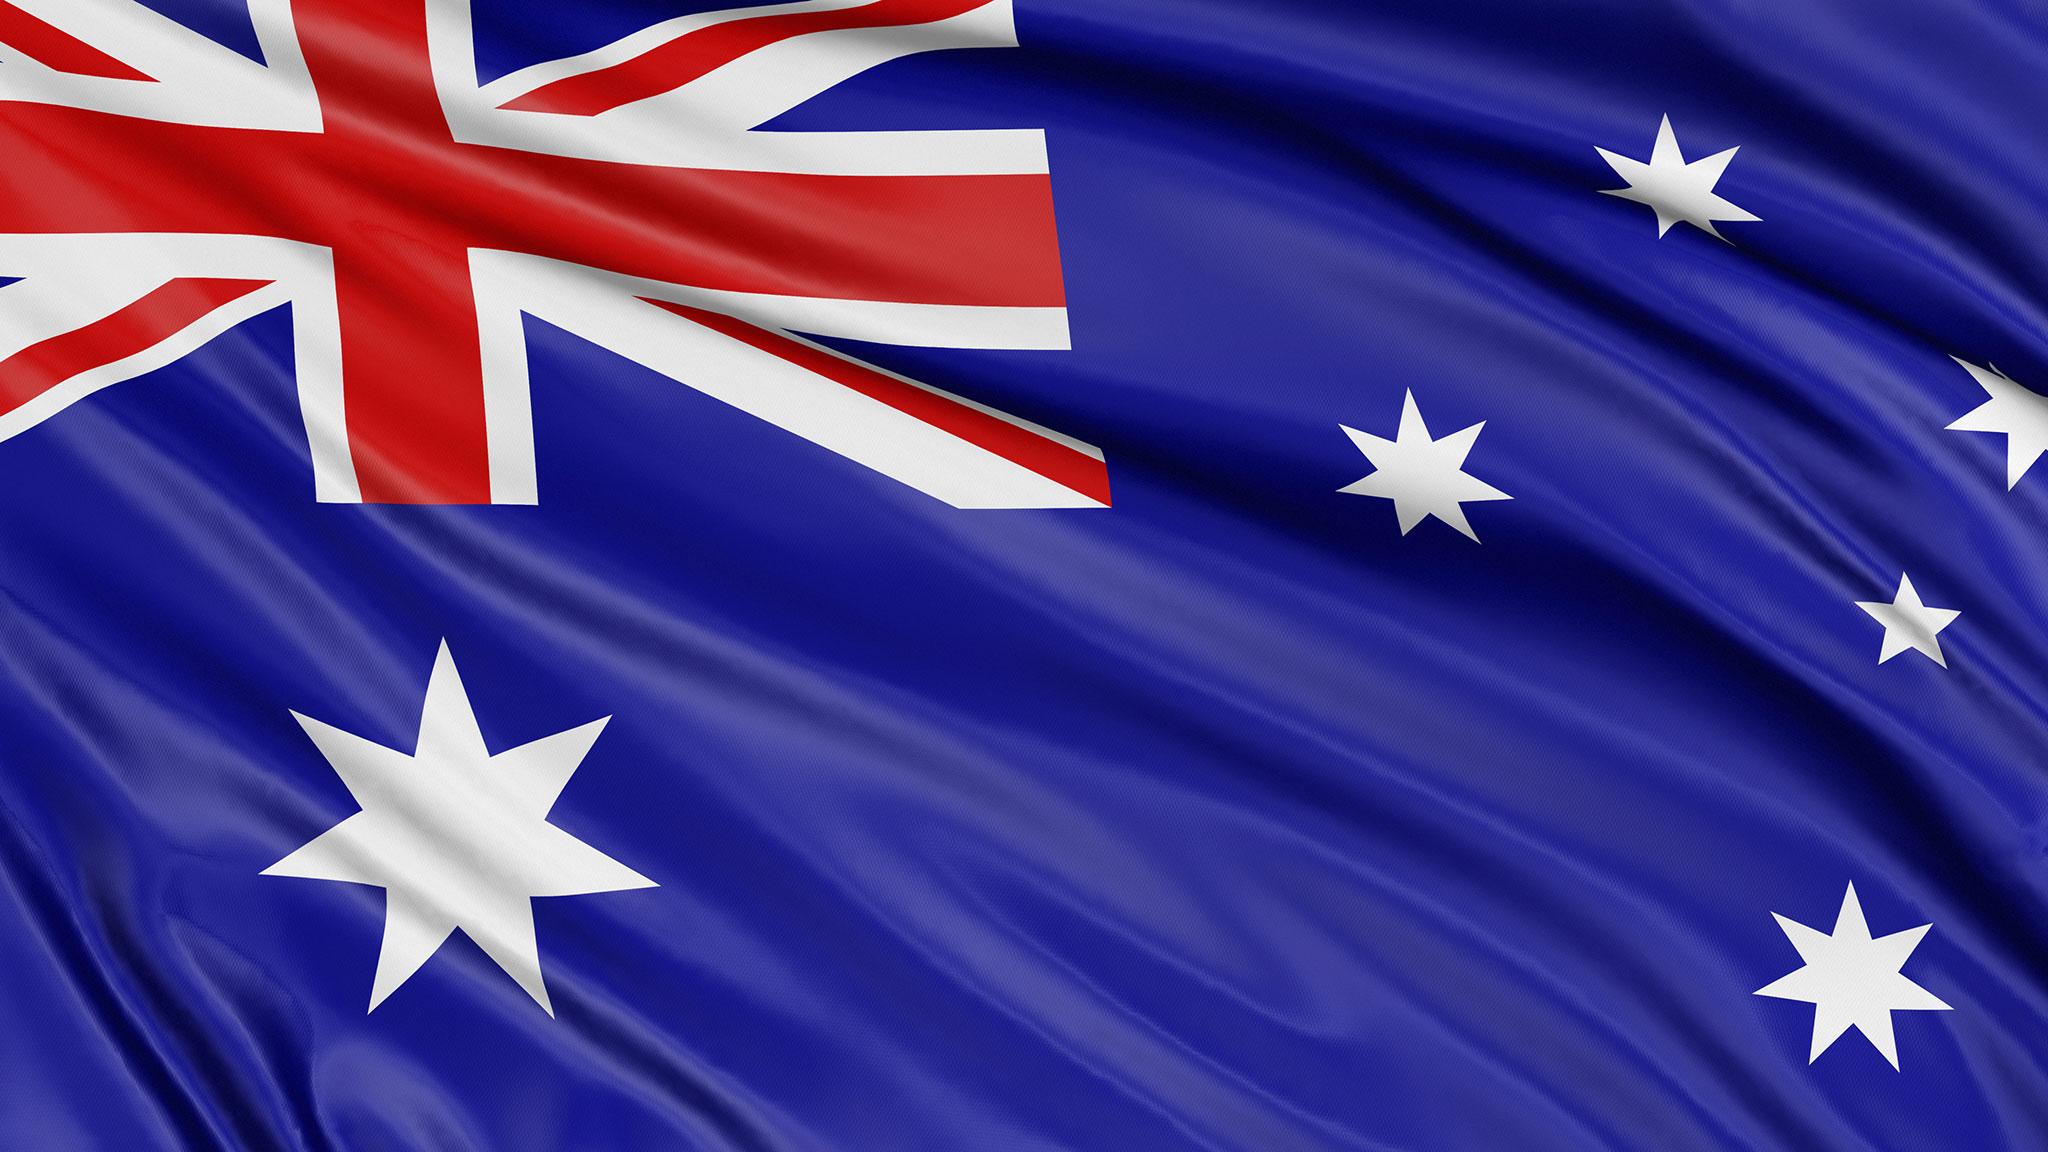 Australia's Federal Police (AFP)